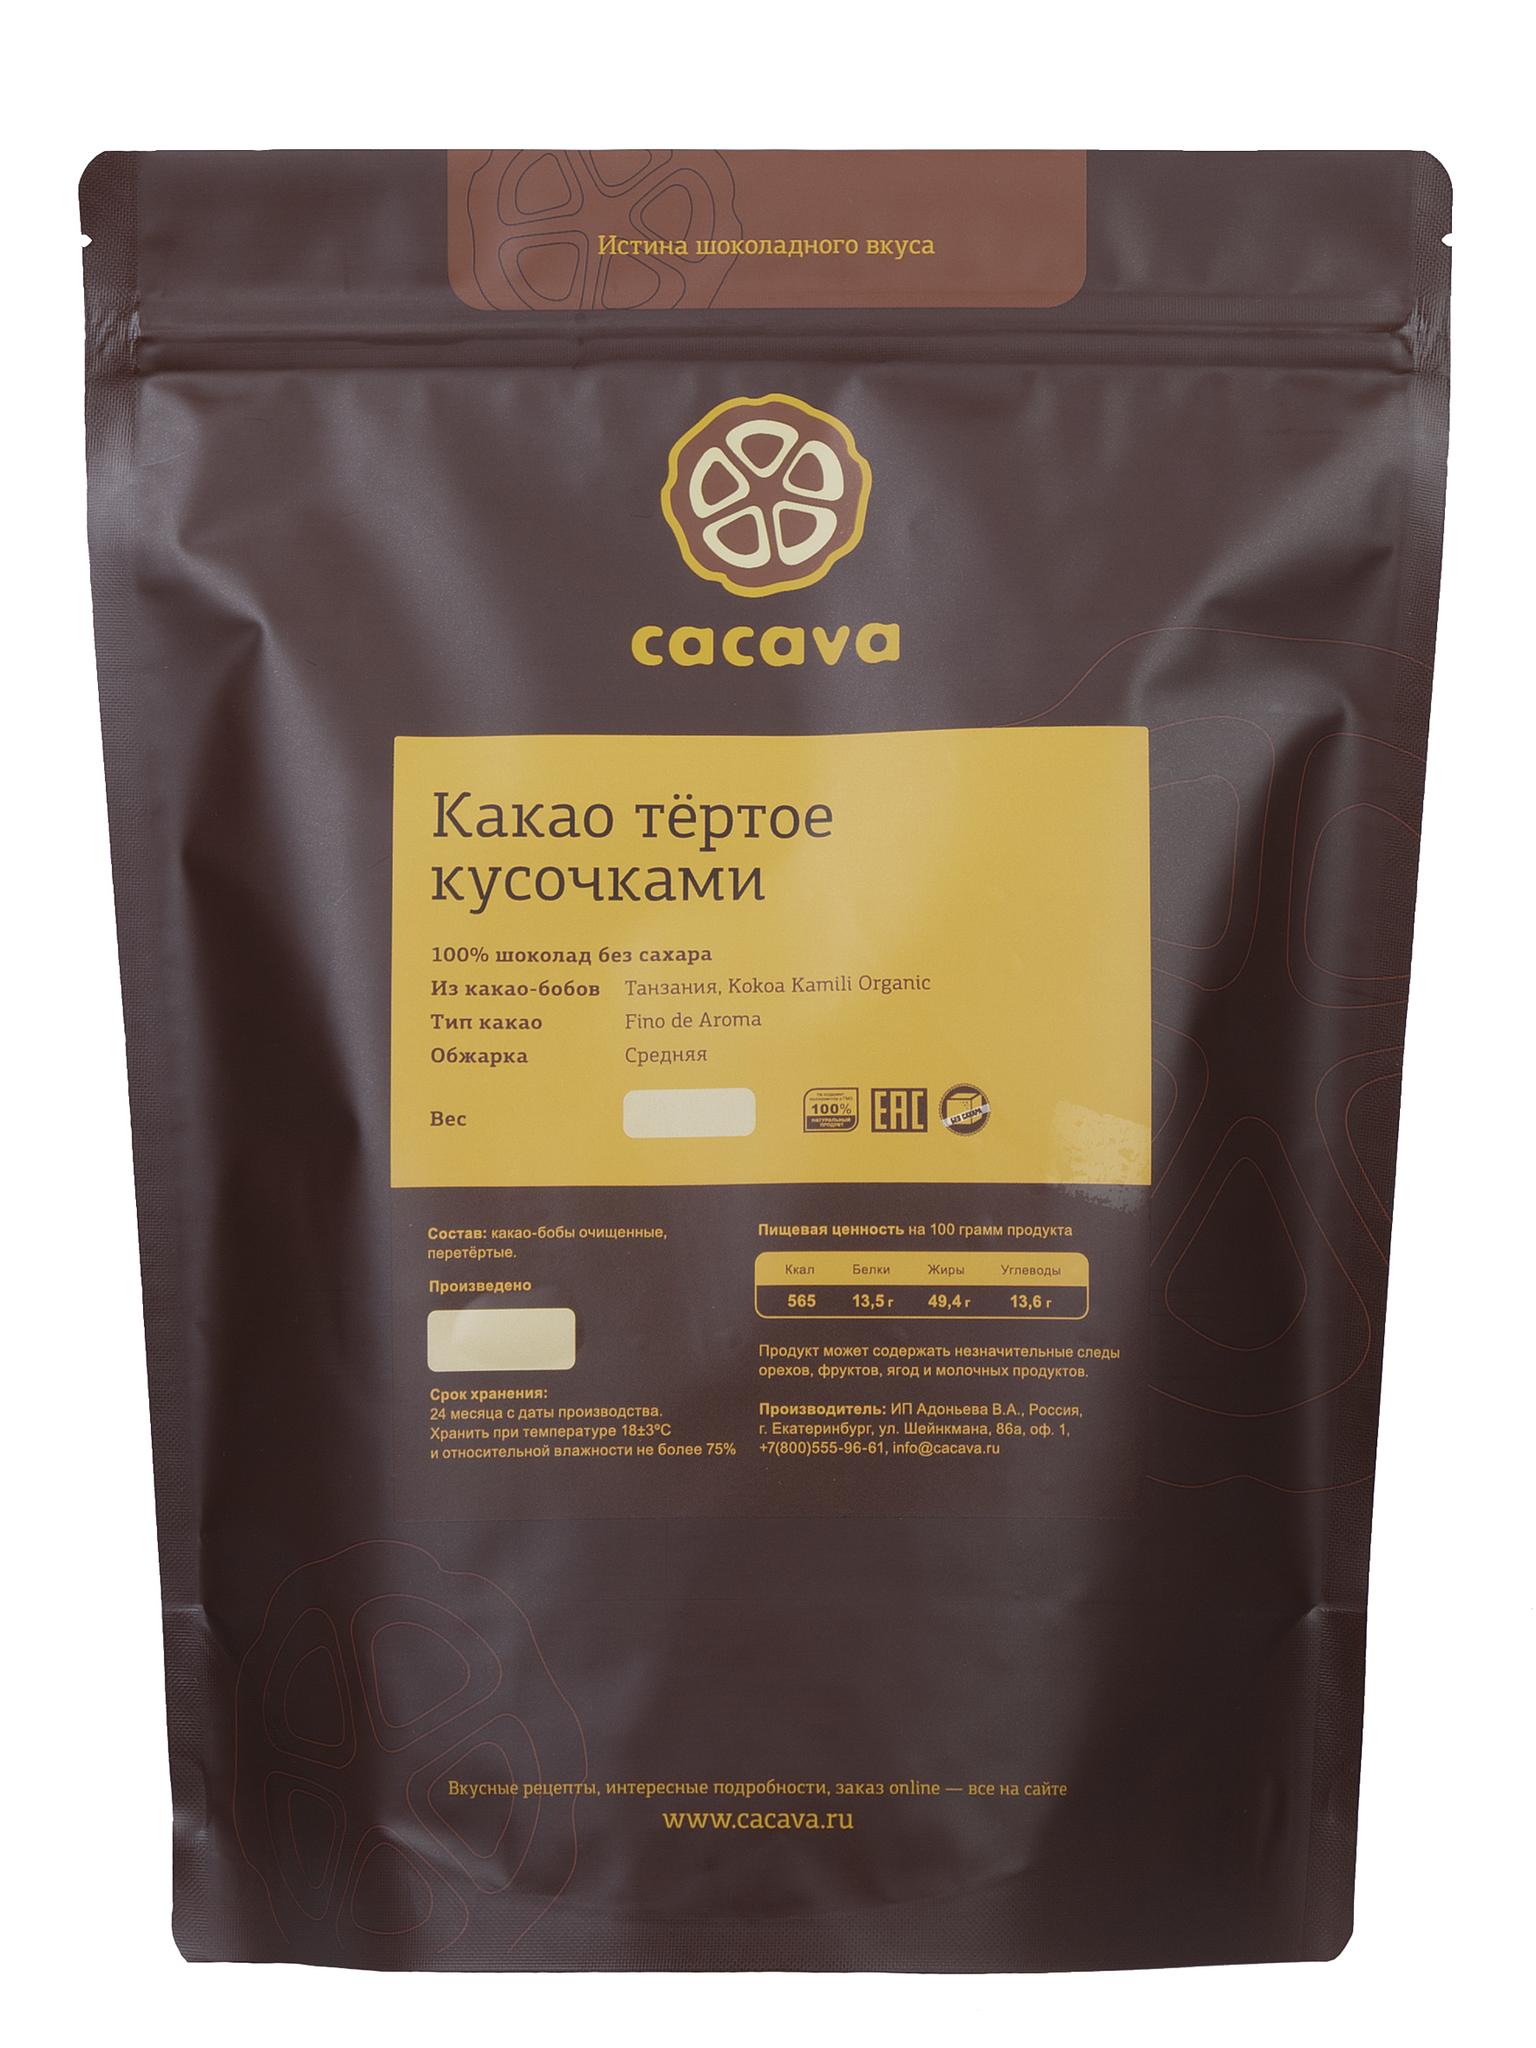 Какао тёртое кусочками (Танзания, Kokoa Kamili), упаковка 1 кг